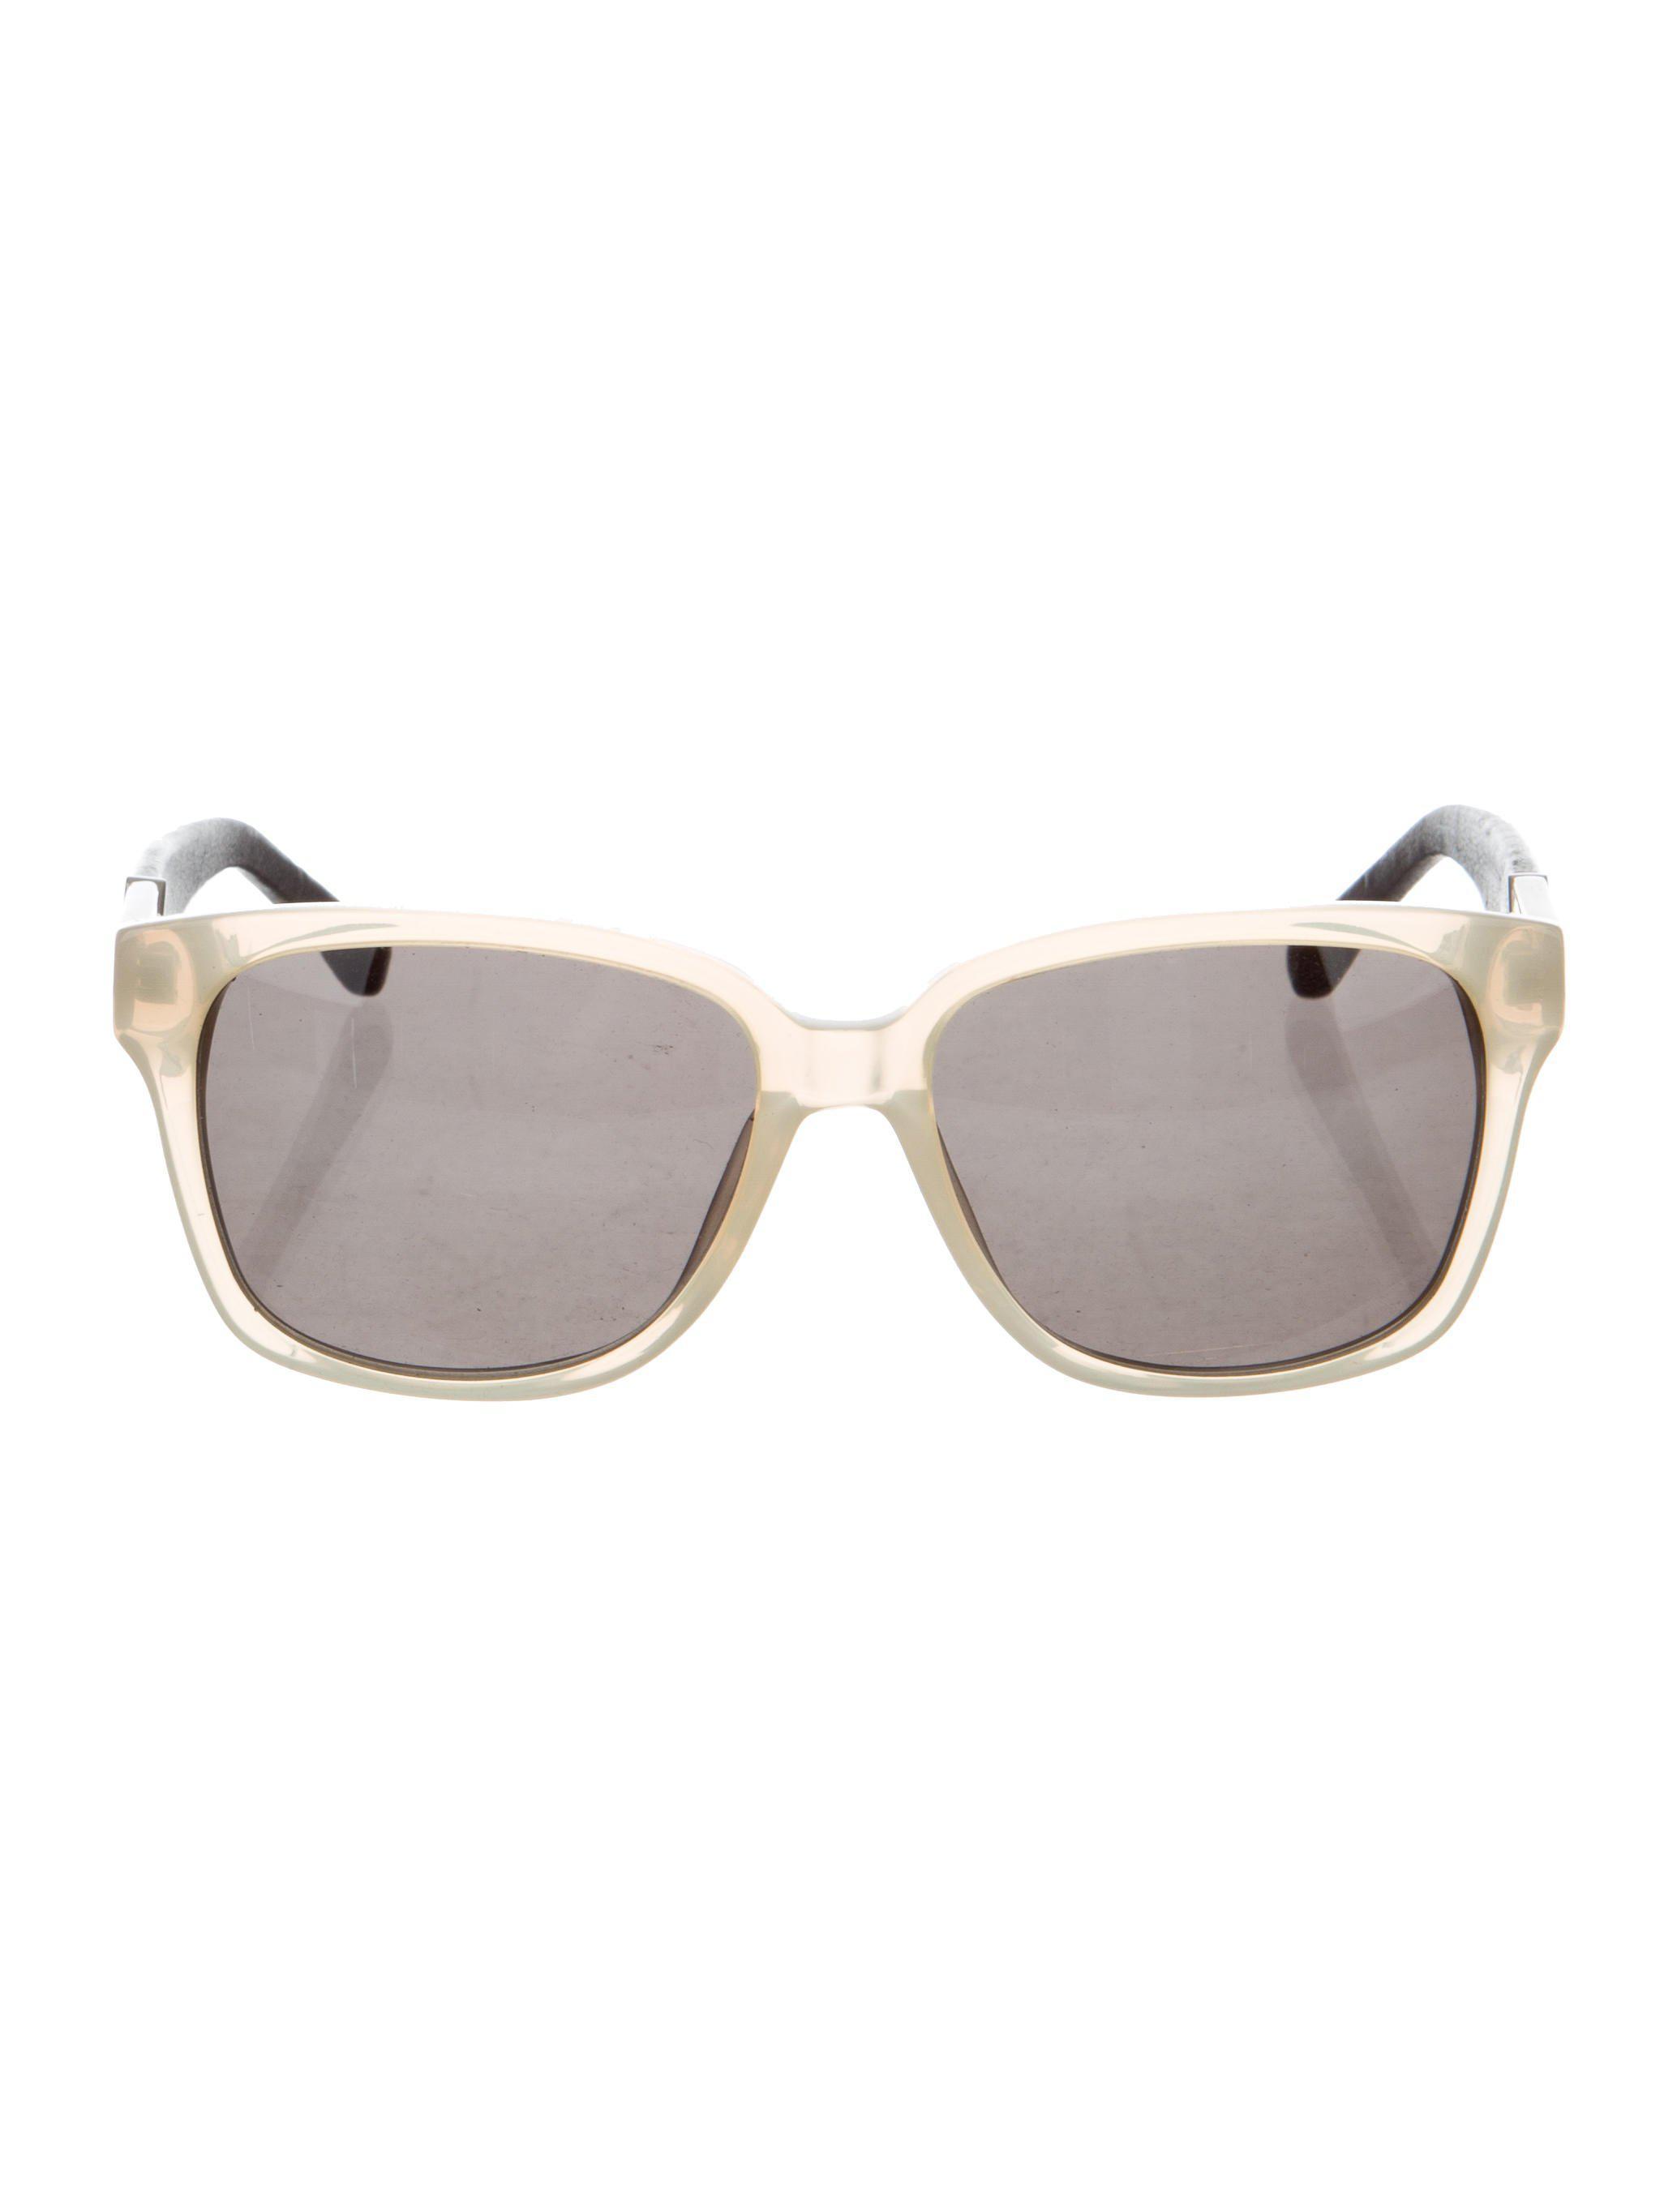 ROW8C4 Sunglasses The Row LjM7xq7s8L